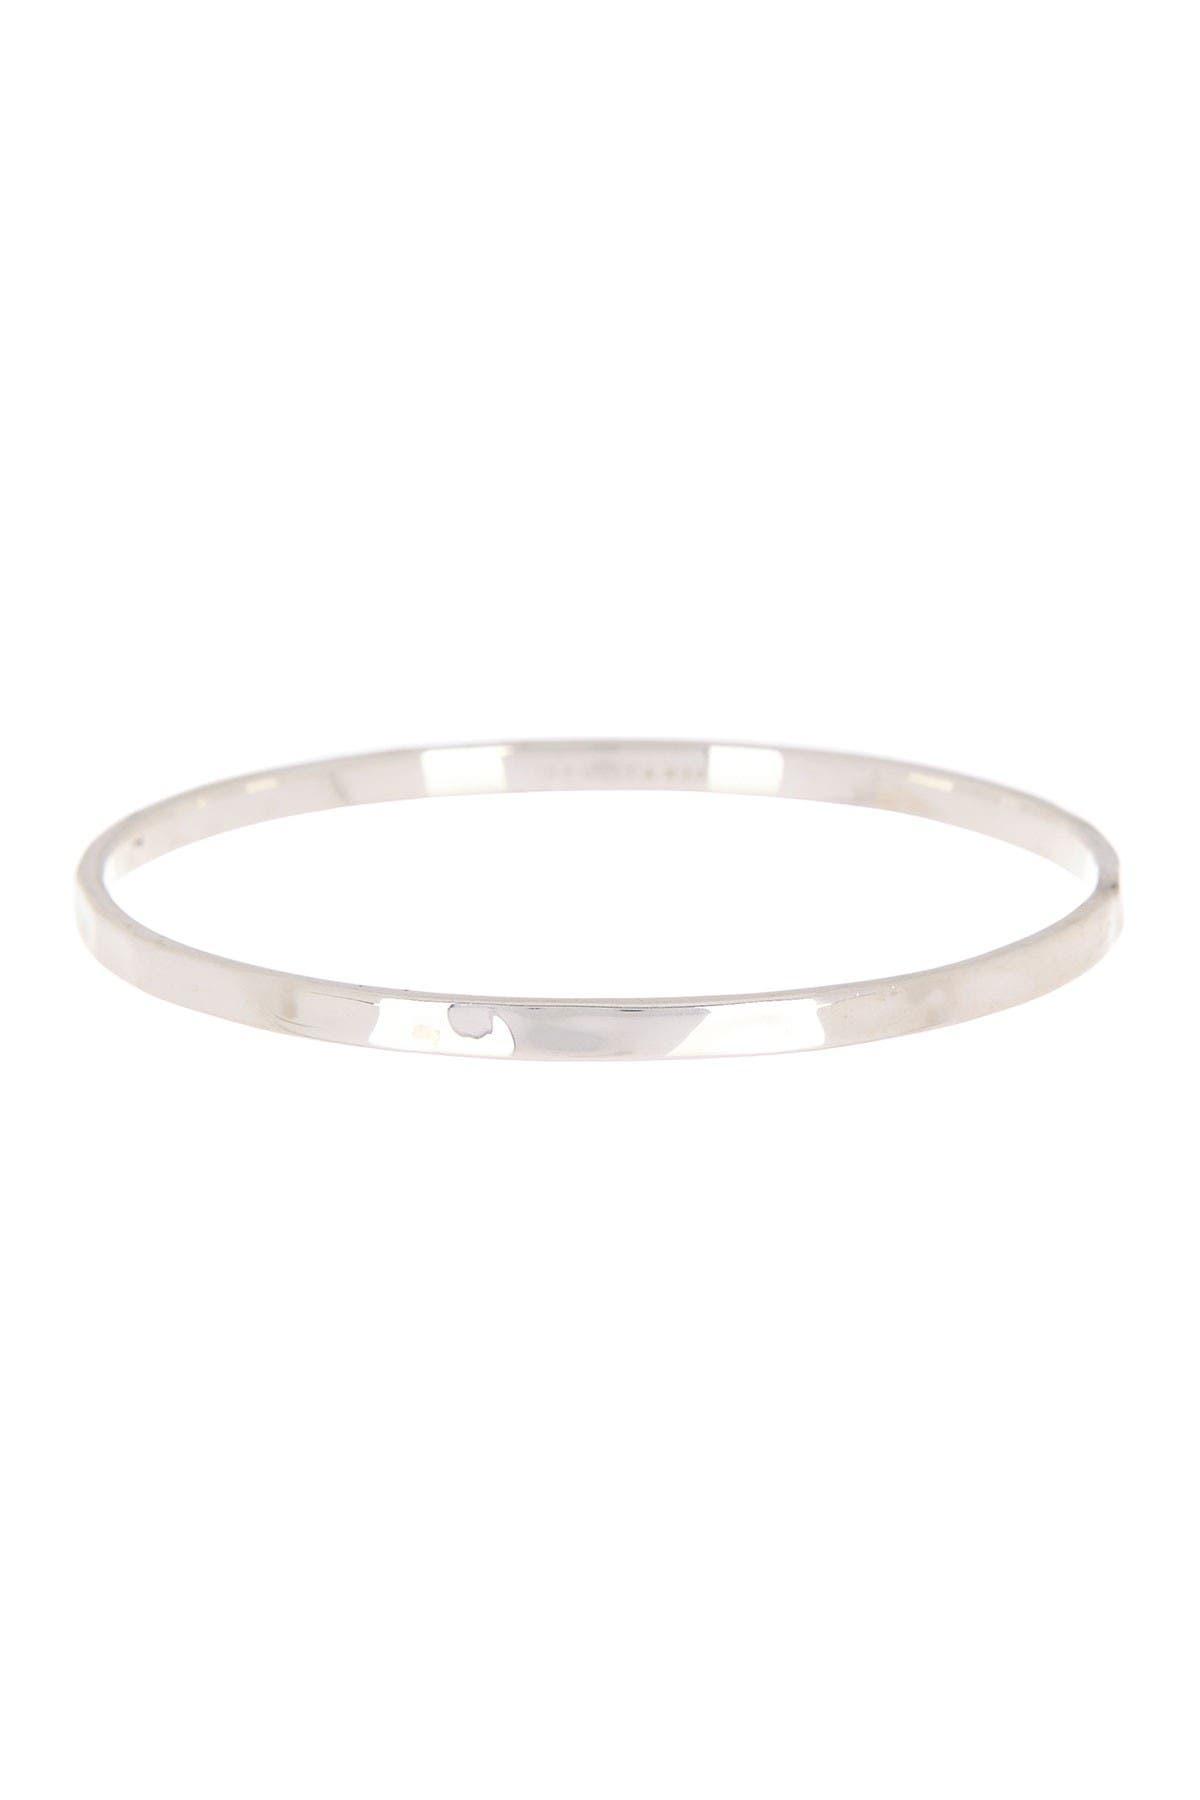 Image of Ippolita Sterling Silver Senso Thin Bangle Bracelet